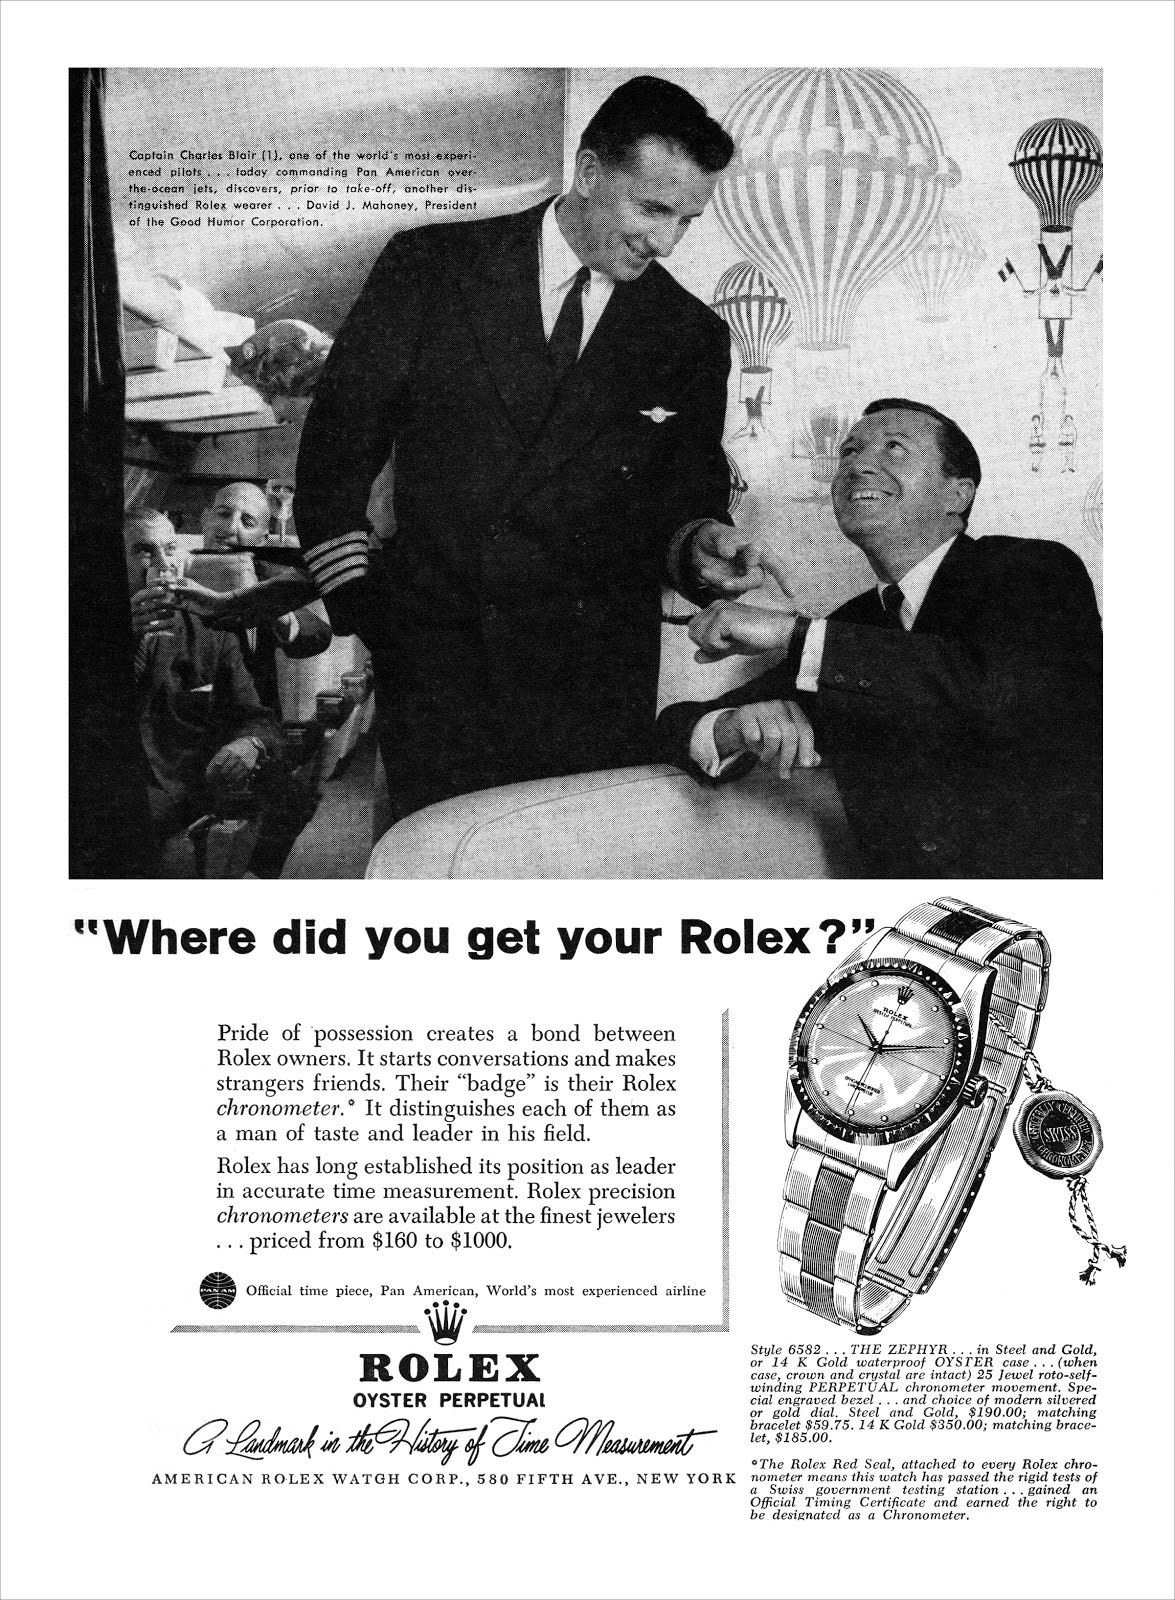 Vintage Rolex Zephyr 6582 ad